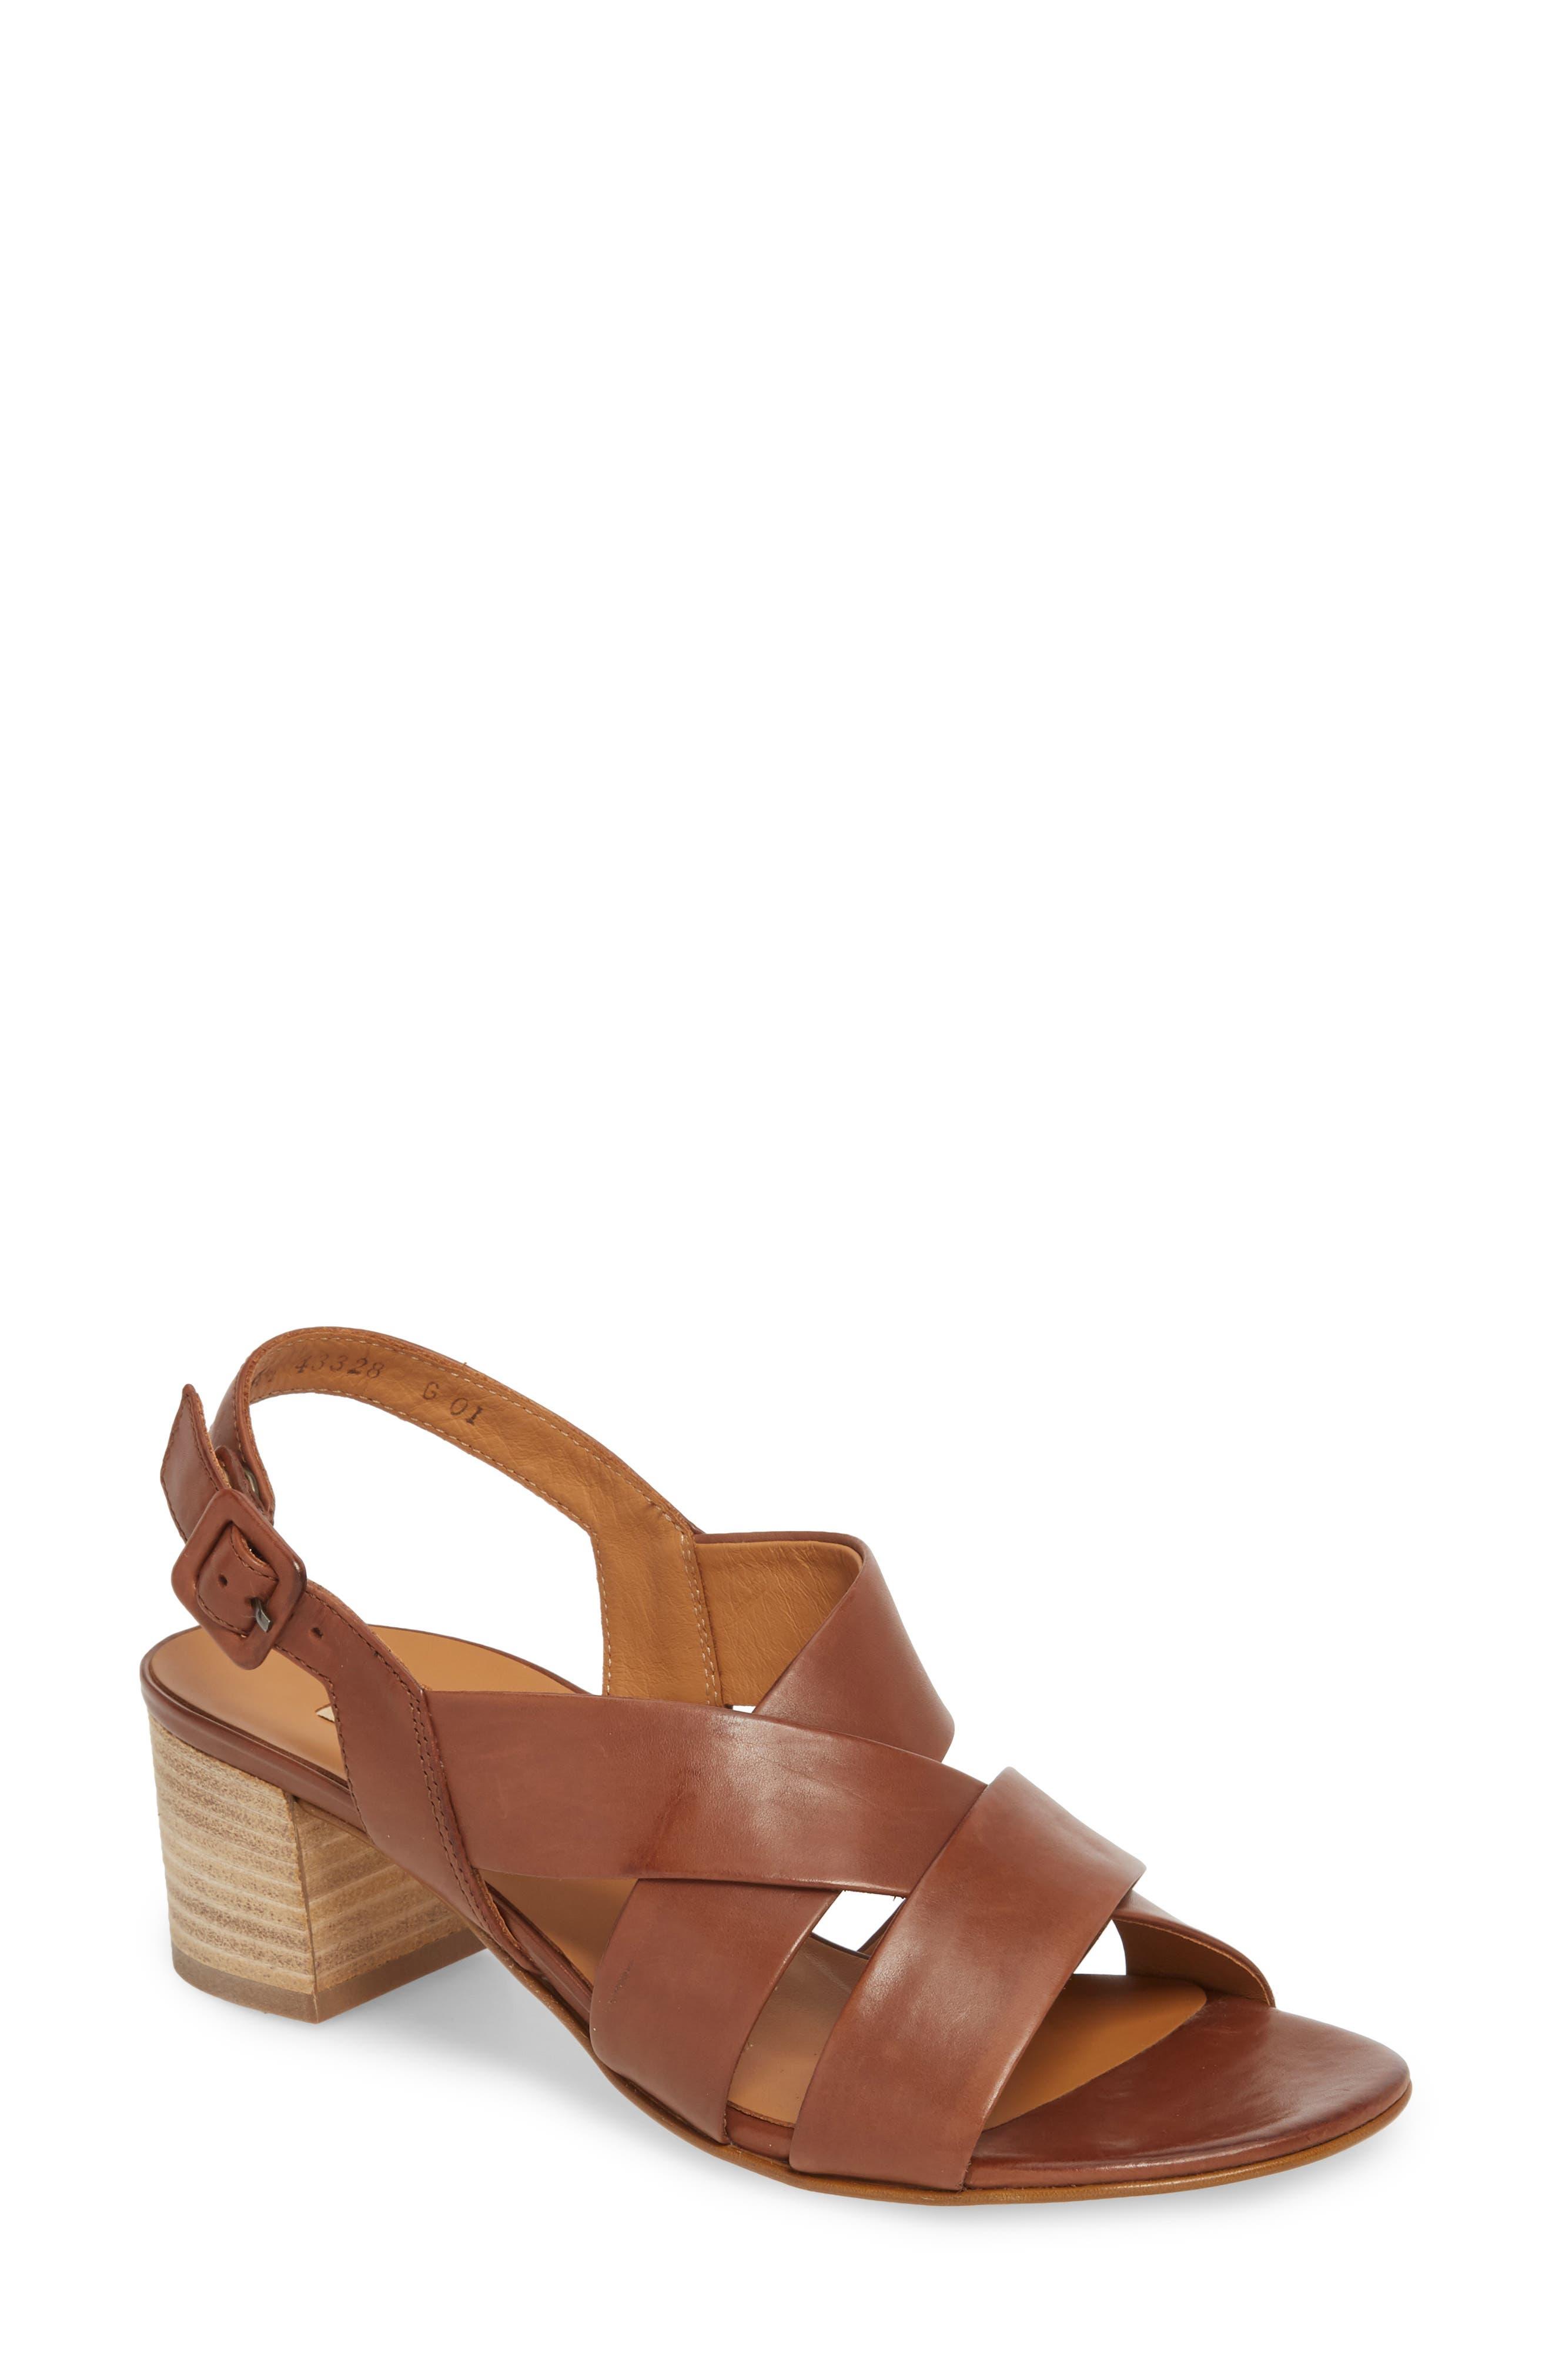 Reese Slingback Sandal,                             Main thumbnail 1, color,                             Nougat Leather